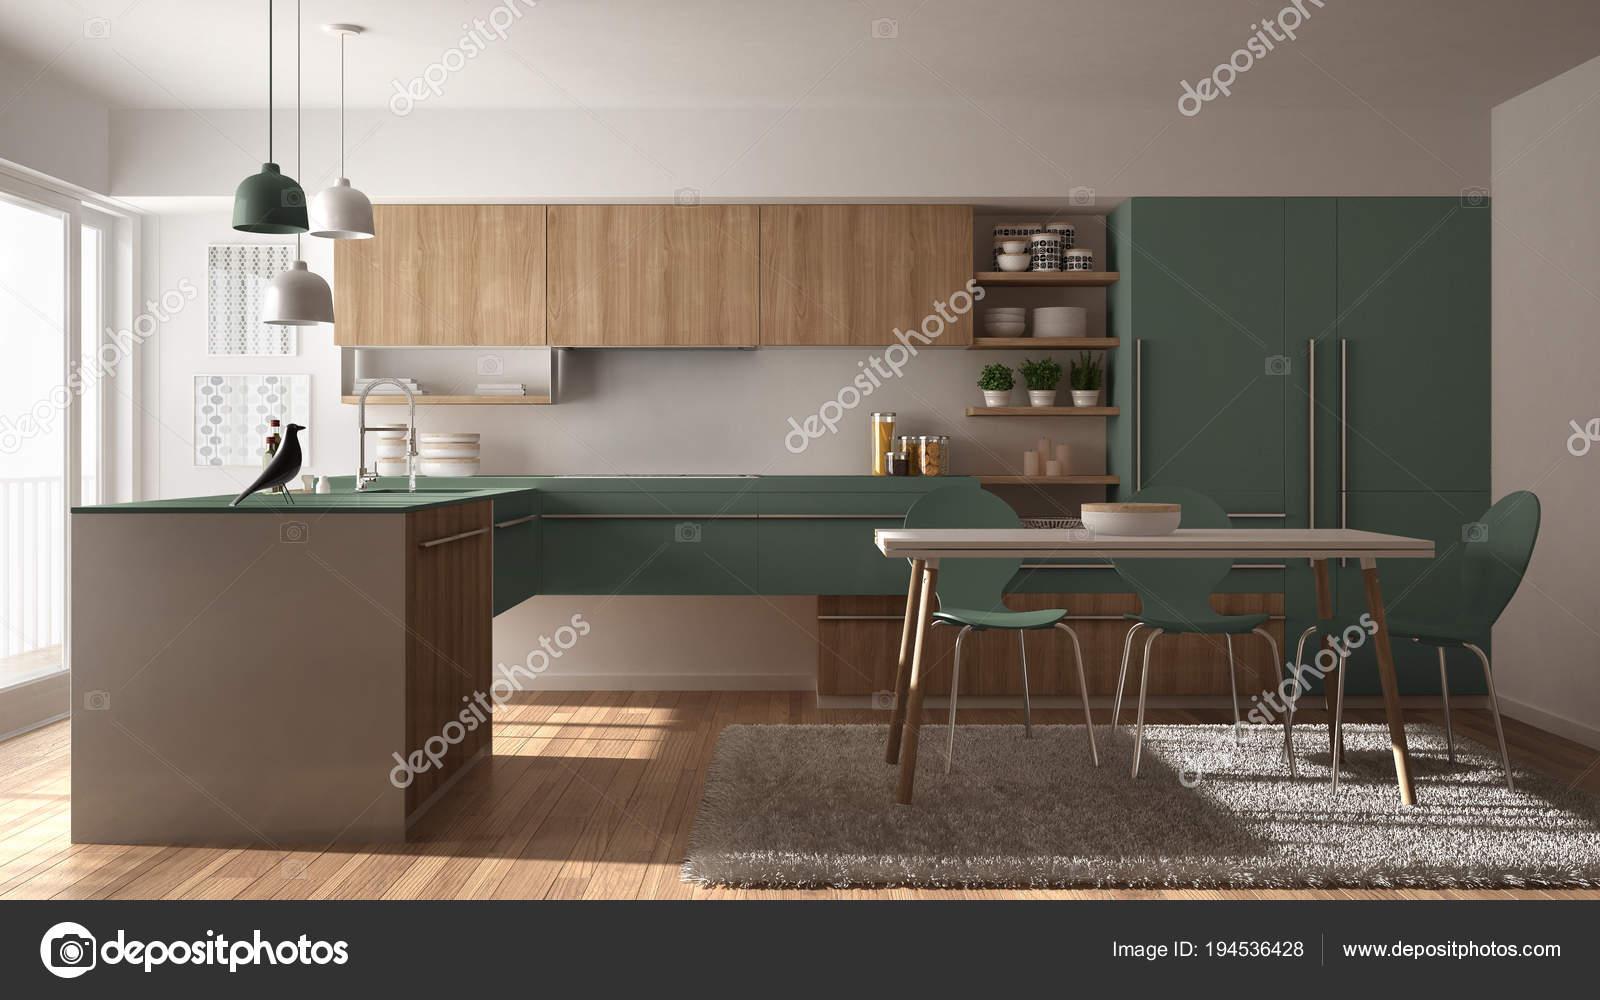 cuisine en bois minimaliste moderne avec table à manger, tapis et